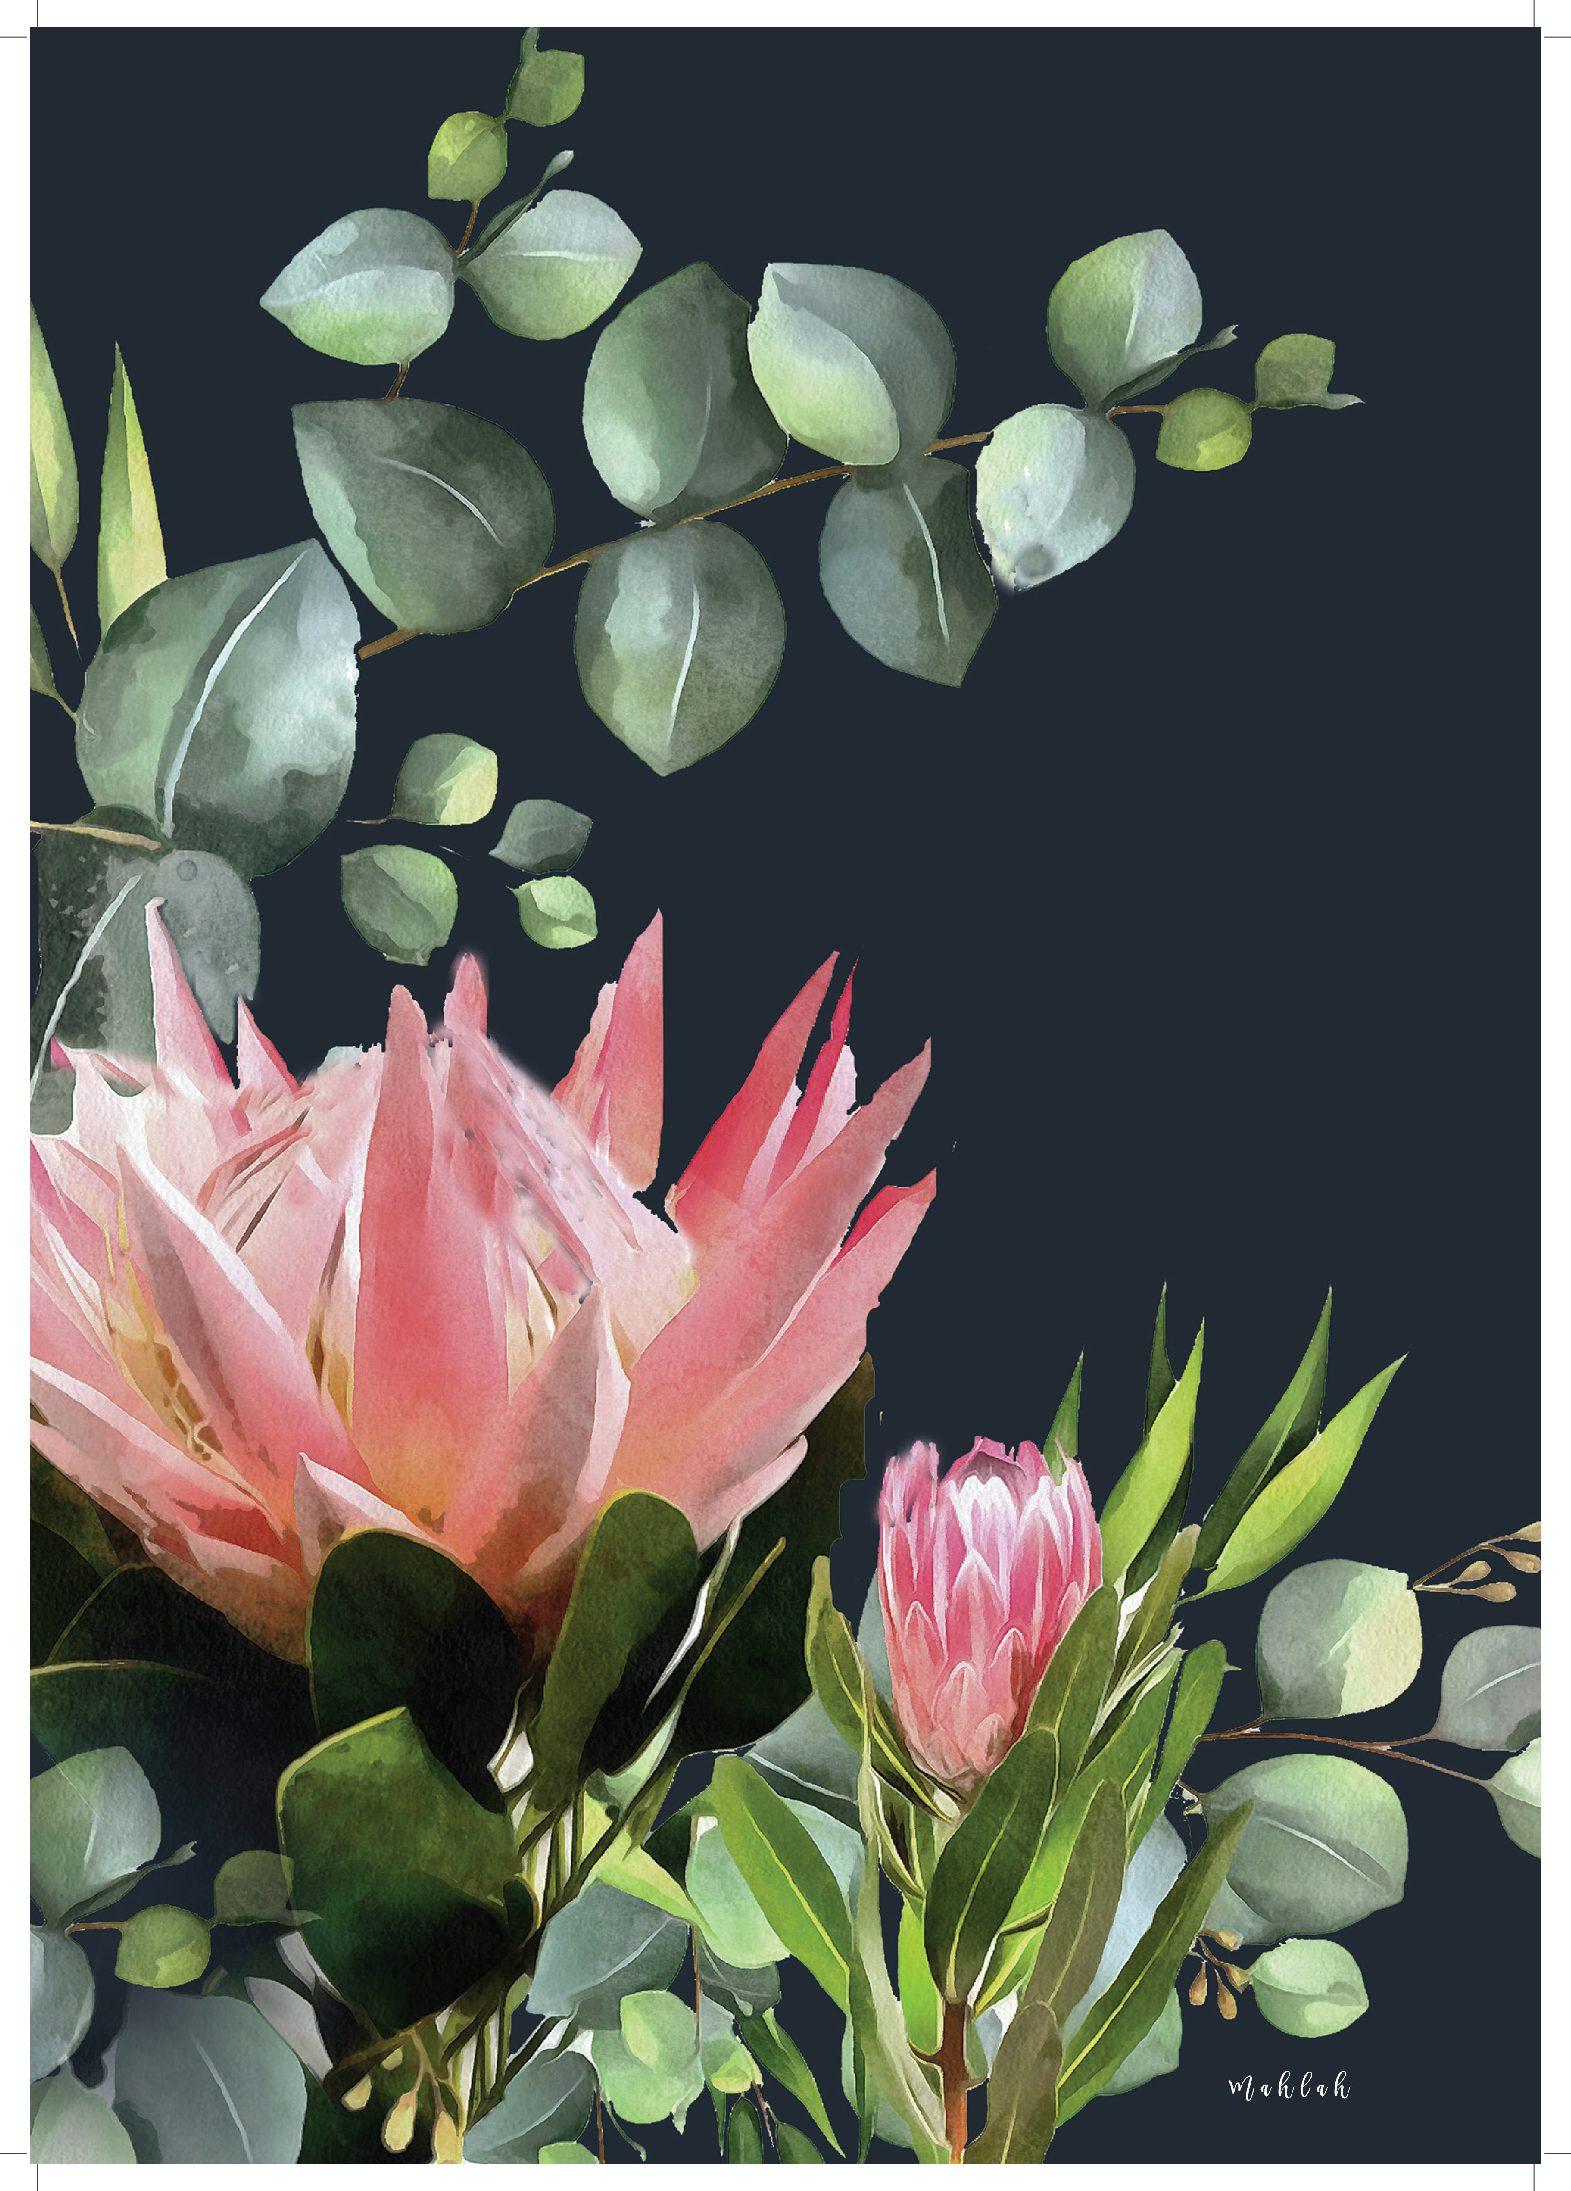 A3 300gsm unframed Bush Pink Print by Mahlah